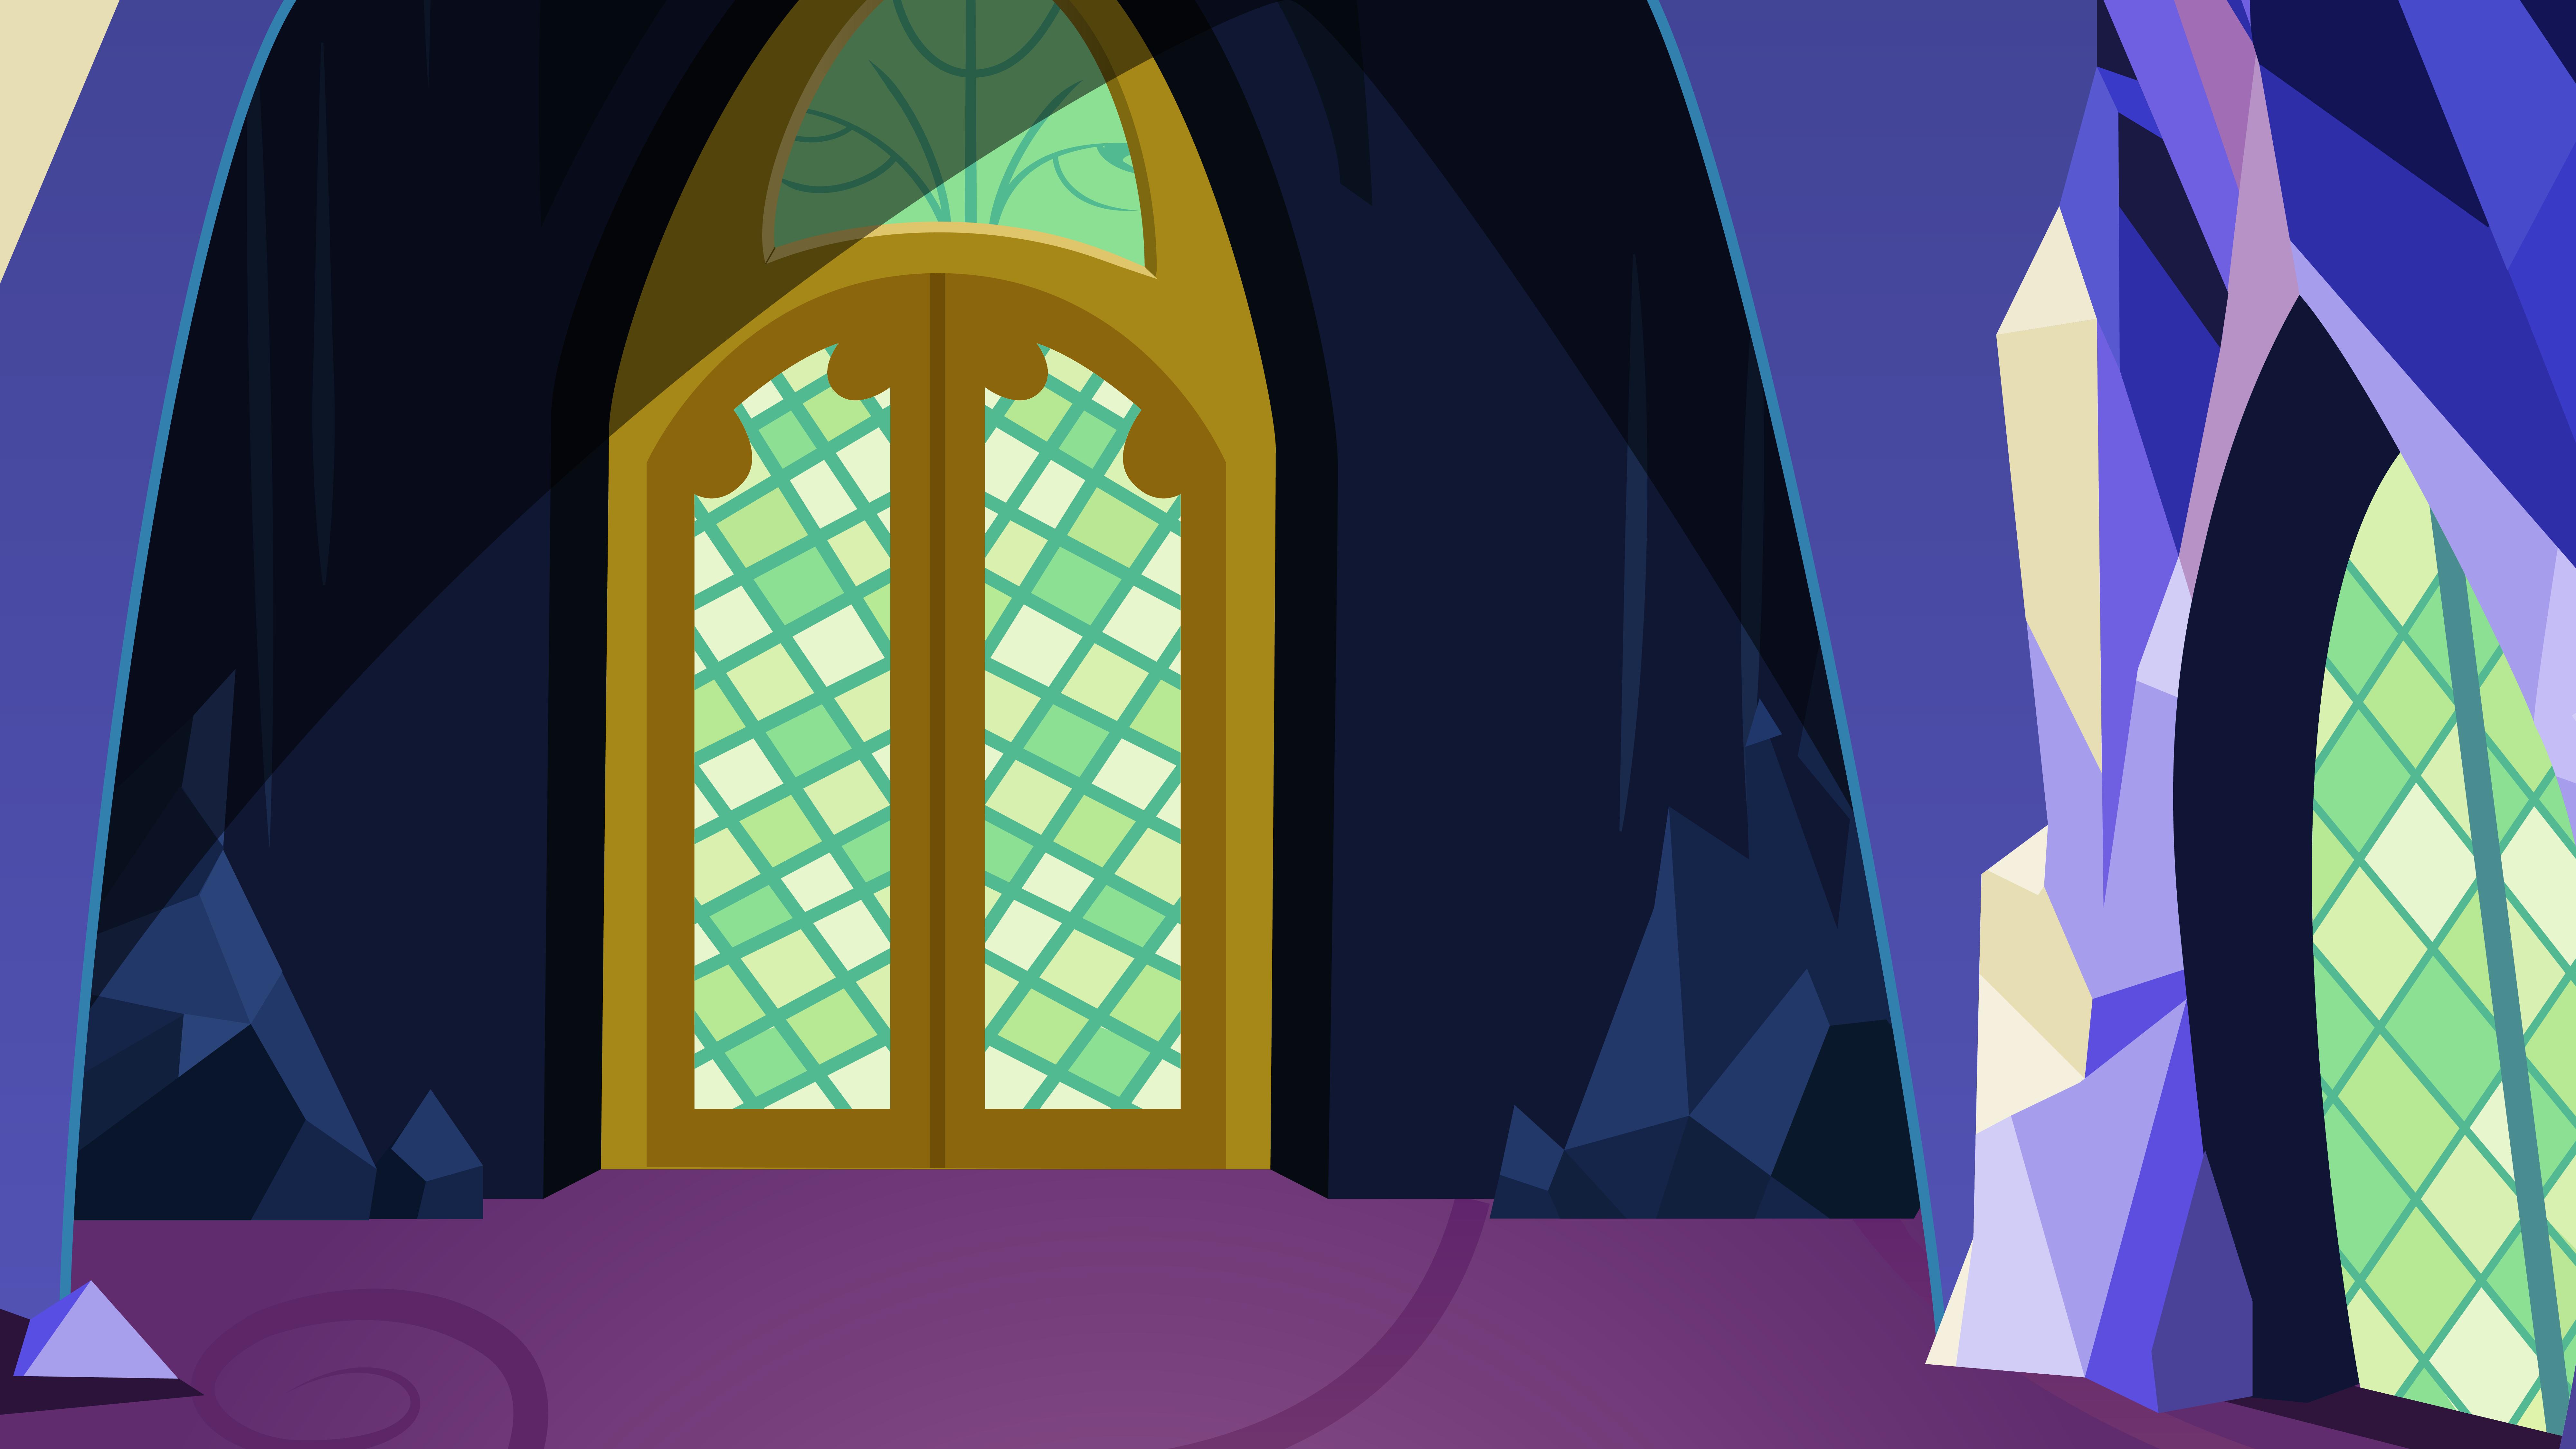 Castle room background - Twilight Sparkle S Castle Throneroom Entrance By Evilbob0 Twilight Sparkle S Castle Throneroom Entrance By Evilbob0